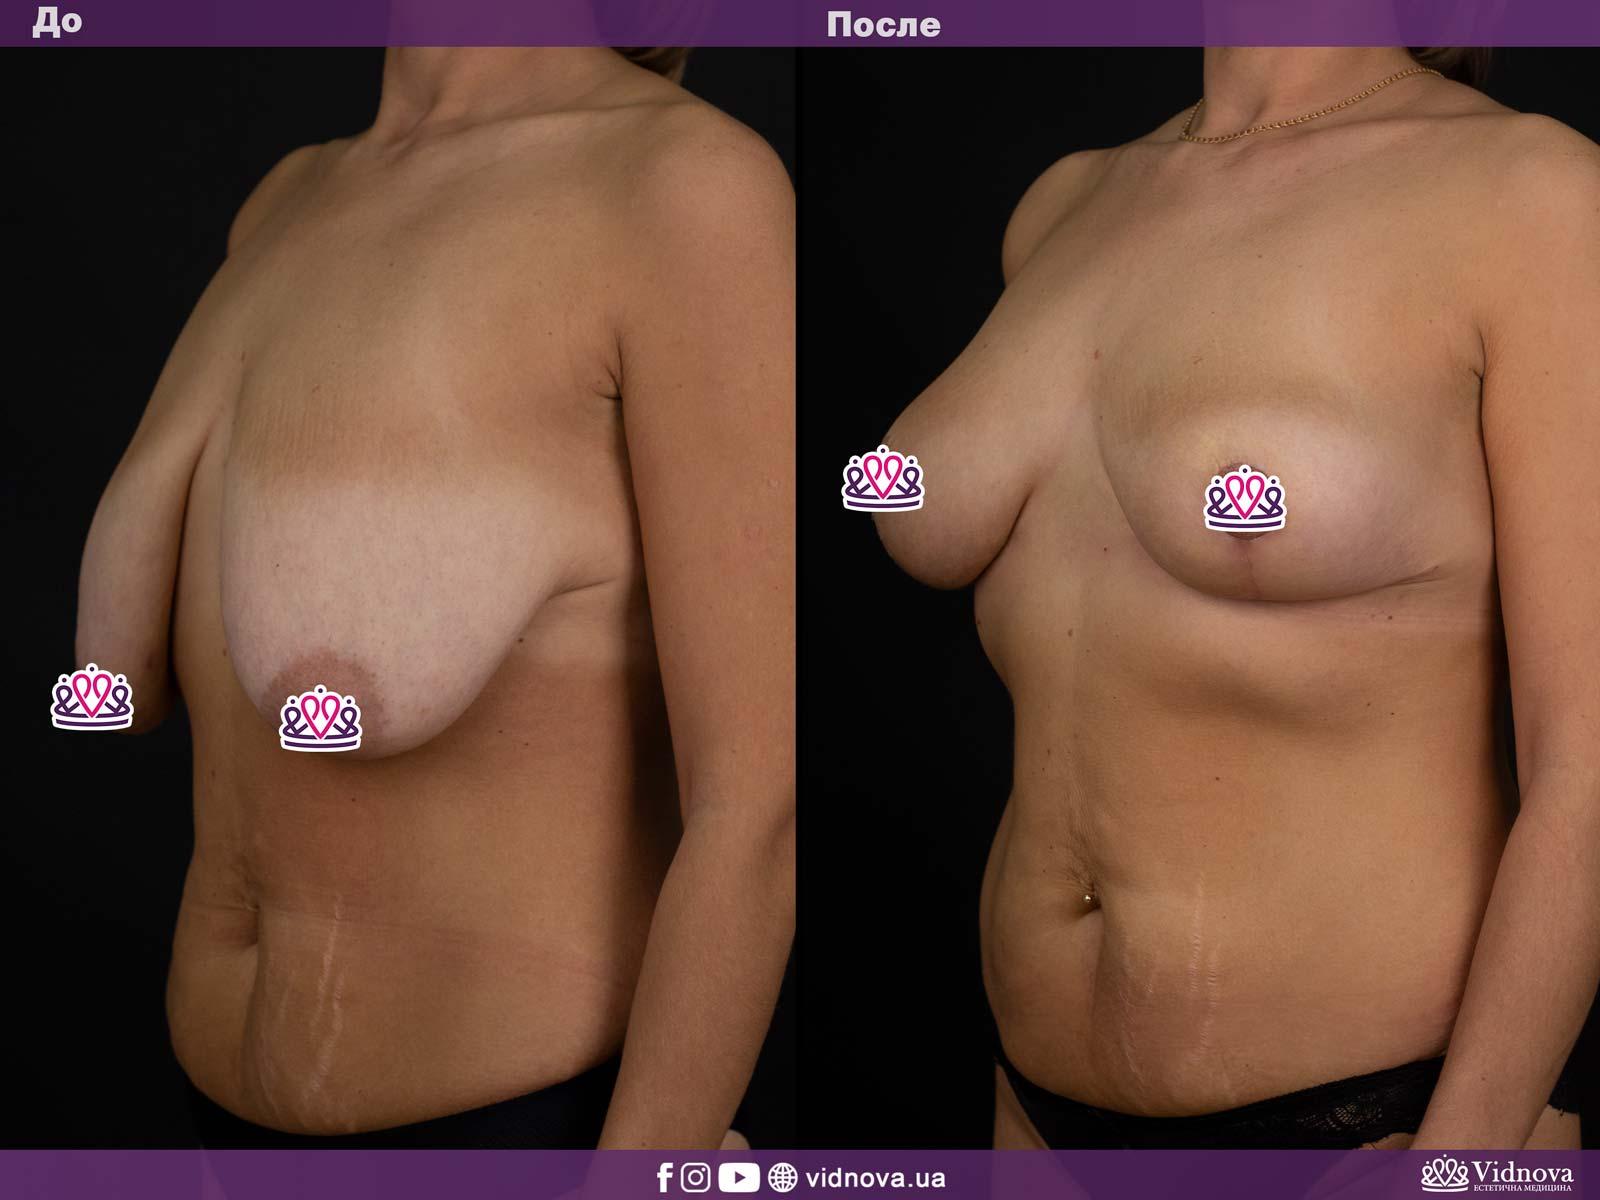 Подтяжка груди: Фото ДО и ПОСЛЕ - Пример №13-2 - Клиника Vidnova